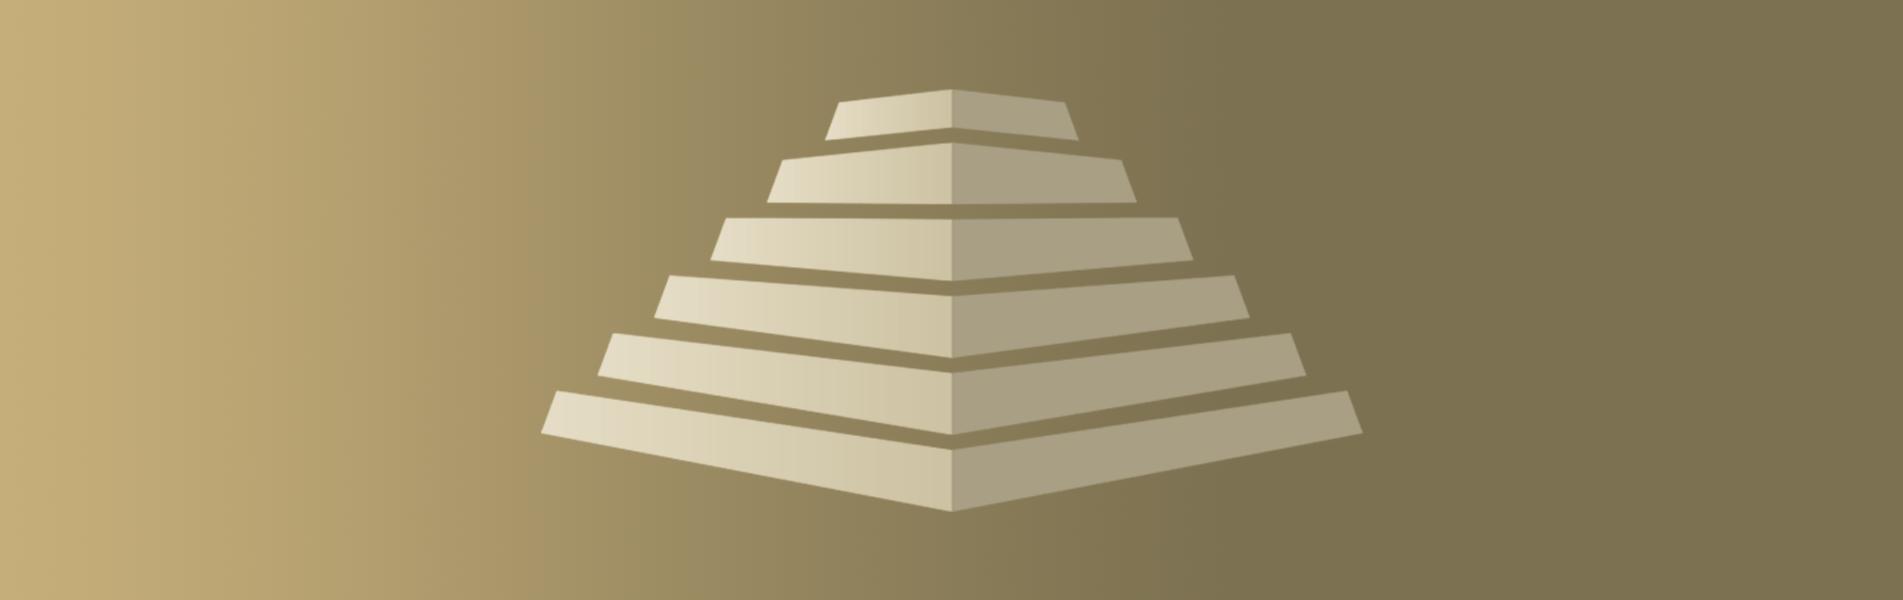 SOLIT Pyramide - Sliderbild